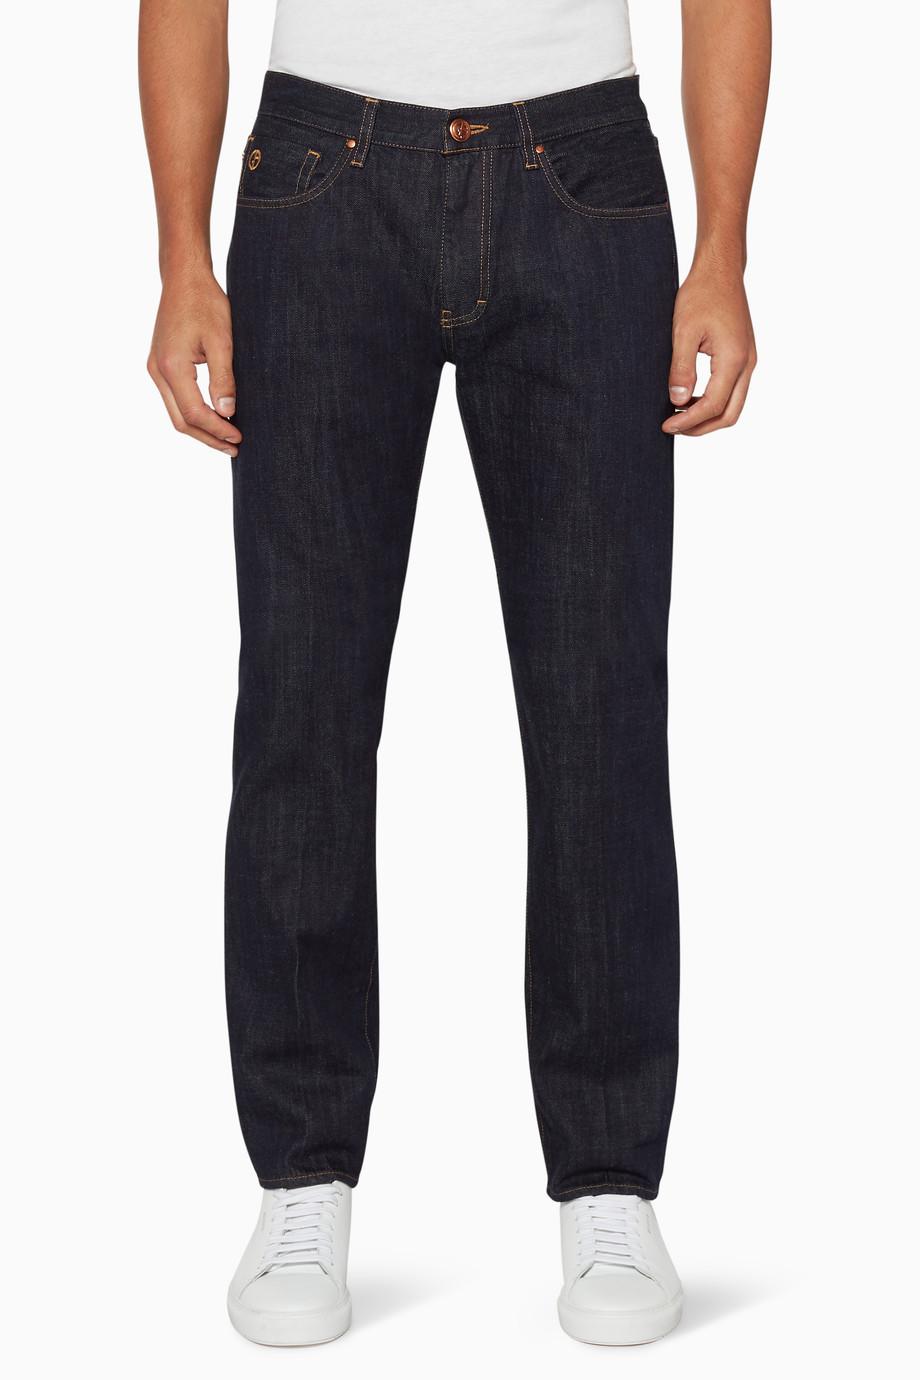 e4cf51ab Shop Giorgio Armani Blue Medium-Wash Tapered Jeans for Men ...